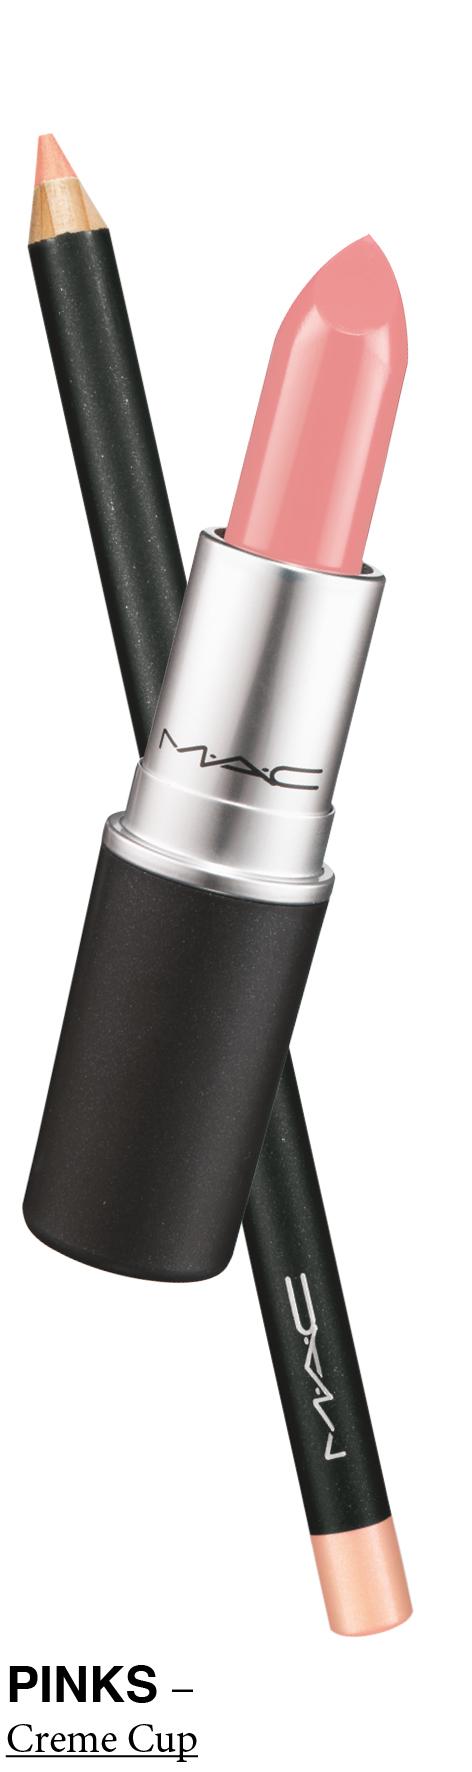 MAC Lip Kits PINKS Creme Cup